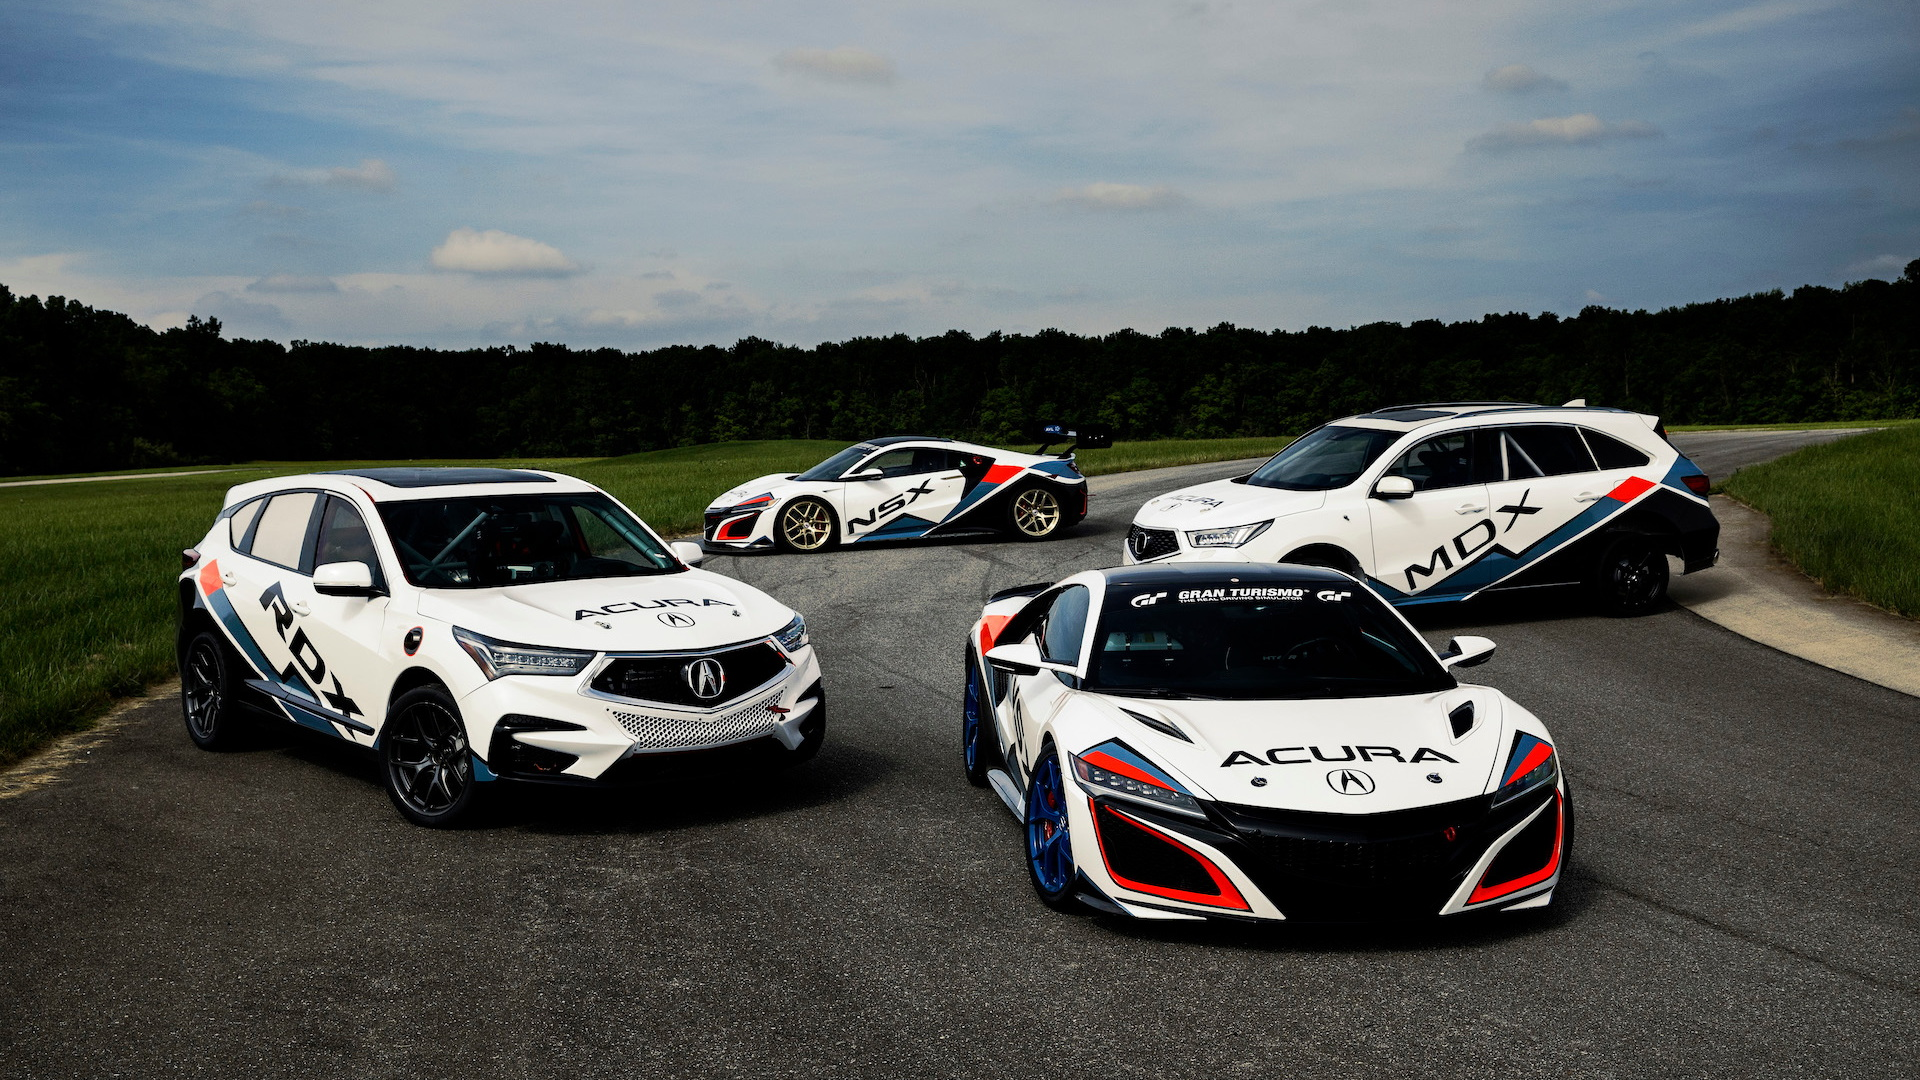 2018 Acura RDX Spy Shots And Latest News >> Car Spy Shots News Reviews And Insights Motor Authority